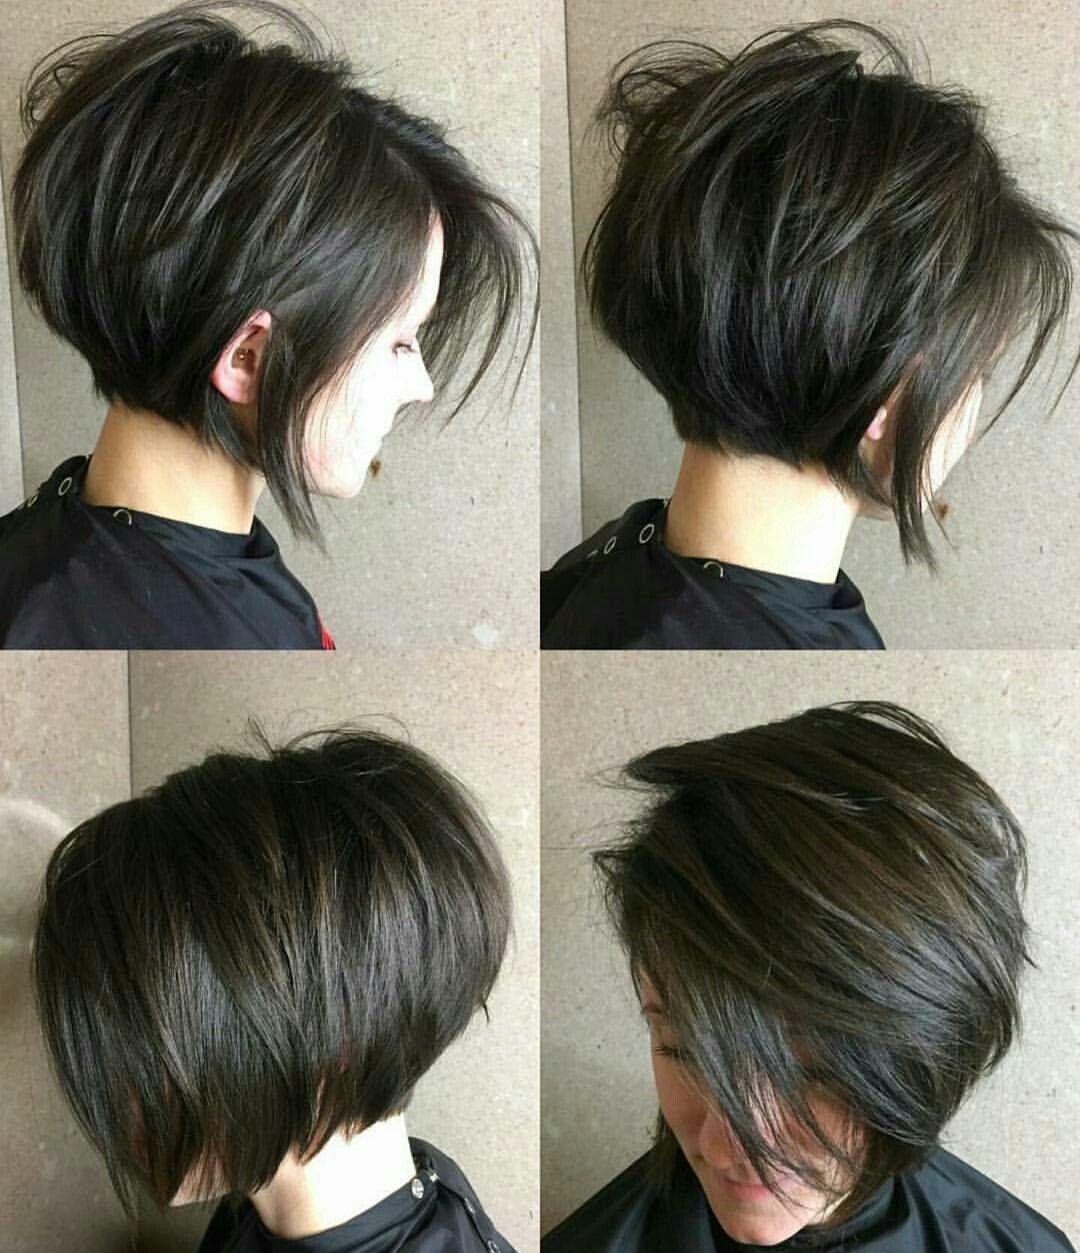 Inspiração cabelos curtos pinterest hair style hair cuts and